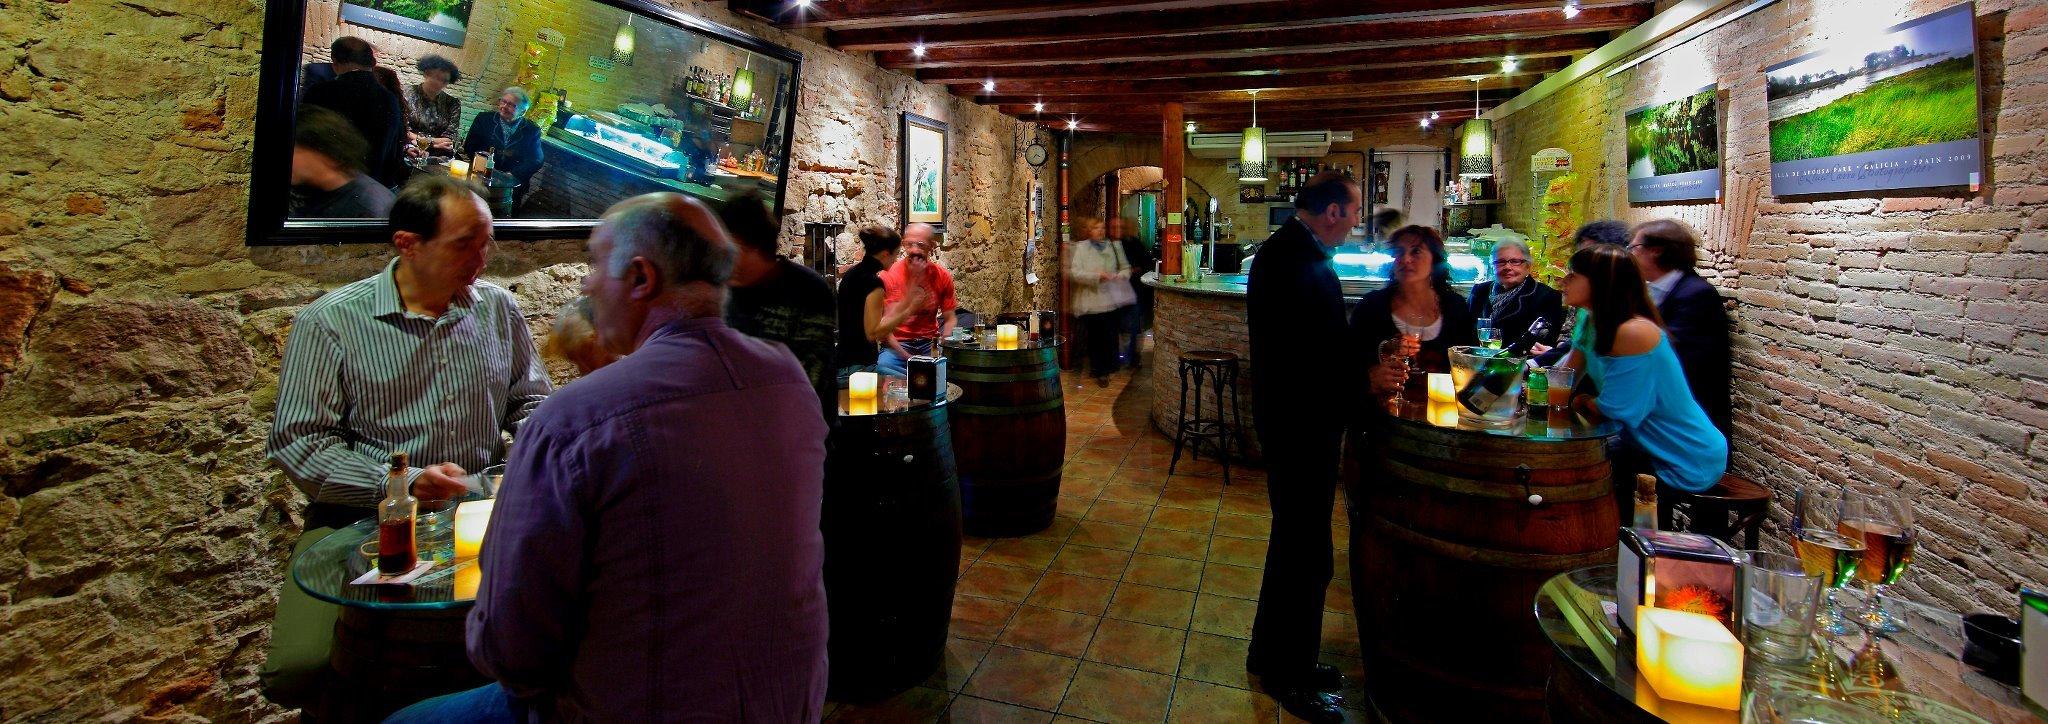 Cucut Biz Bar